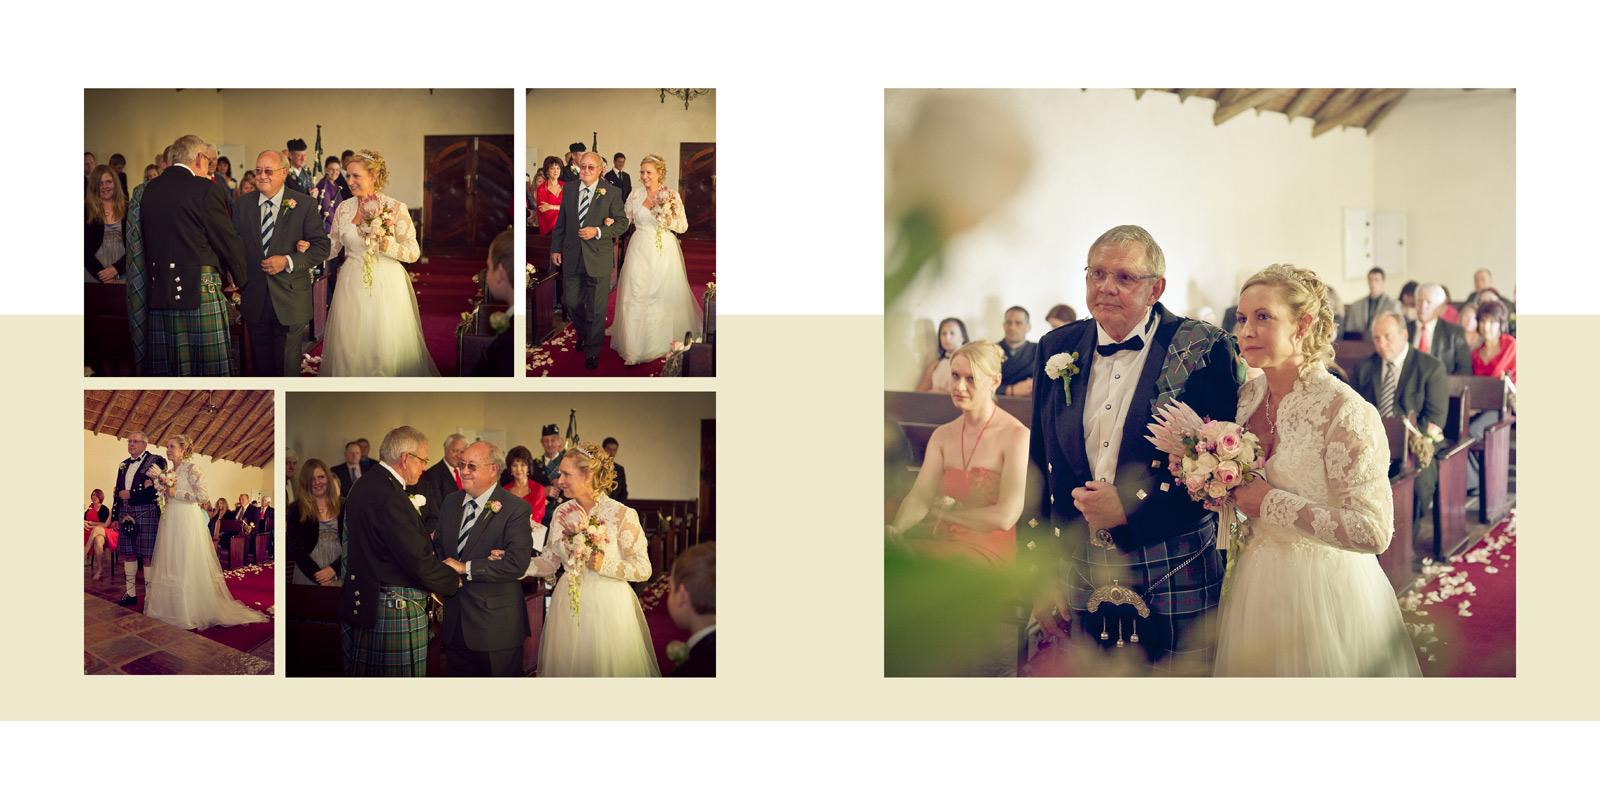 Nathalie Boucry Photography | Deidre and Lister Wedding Album 010